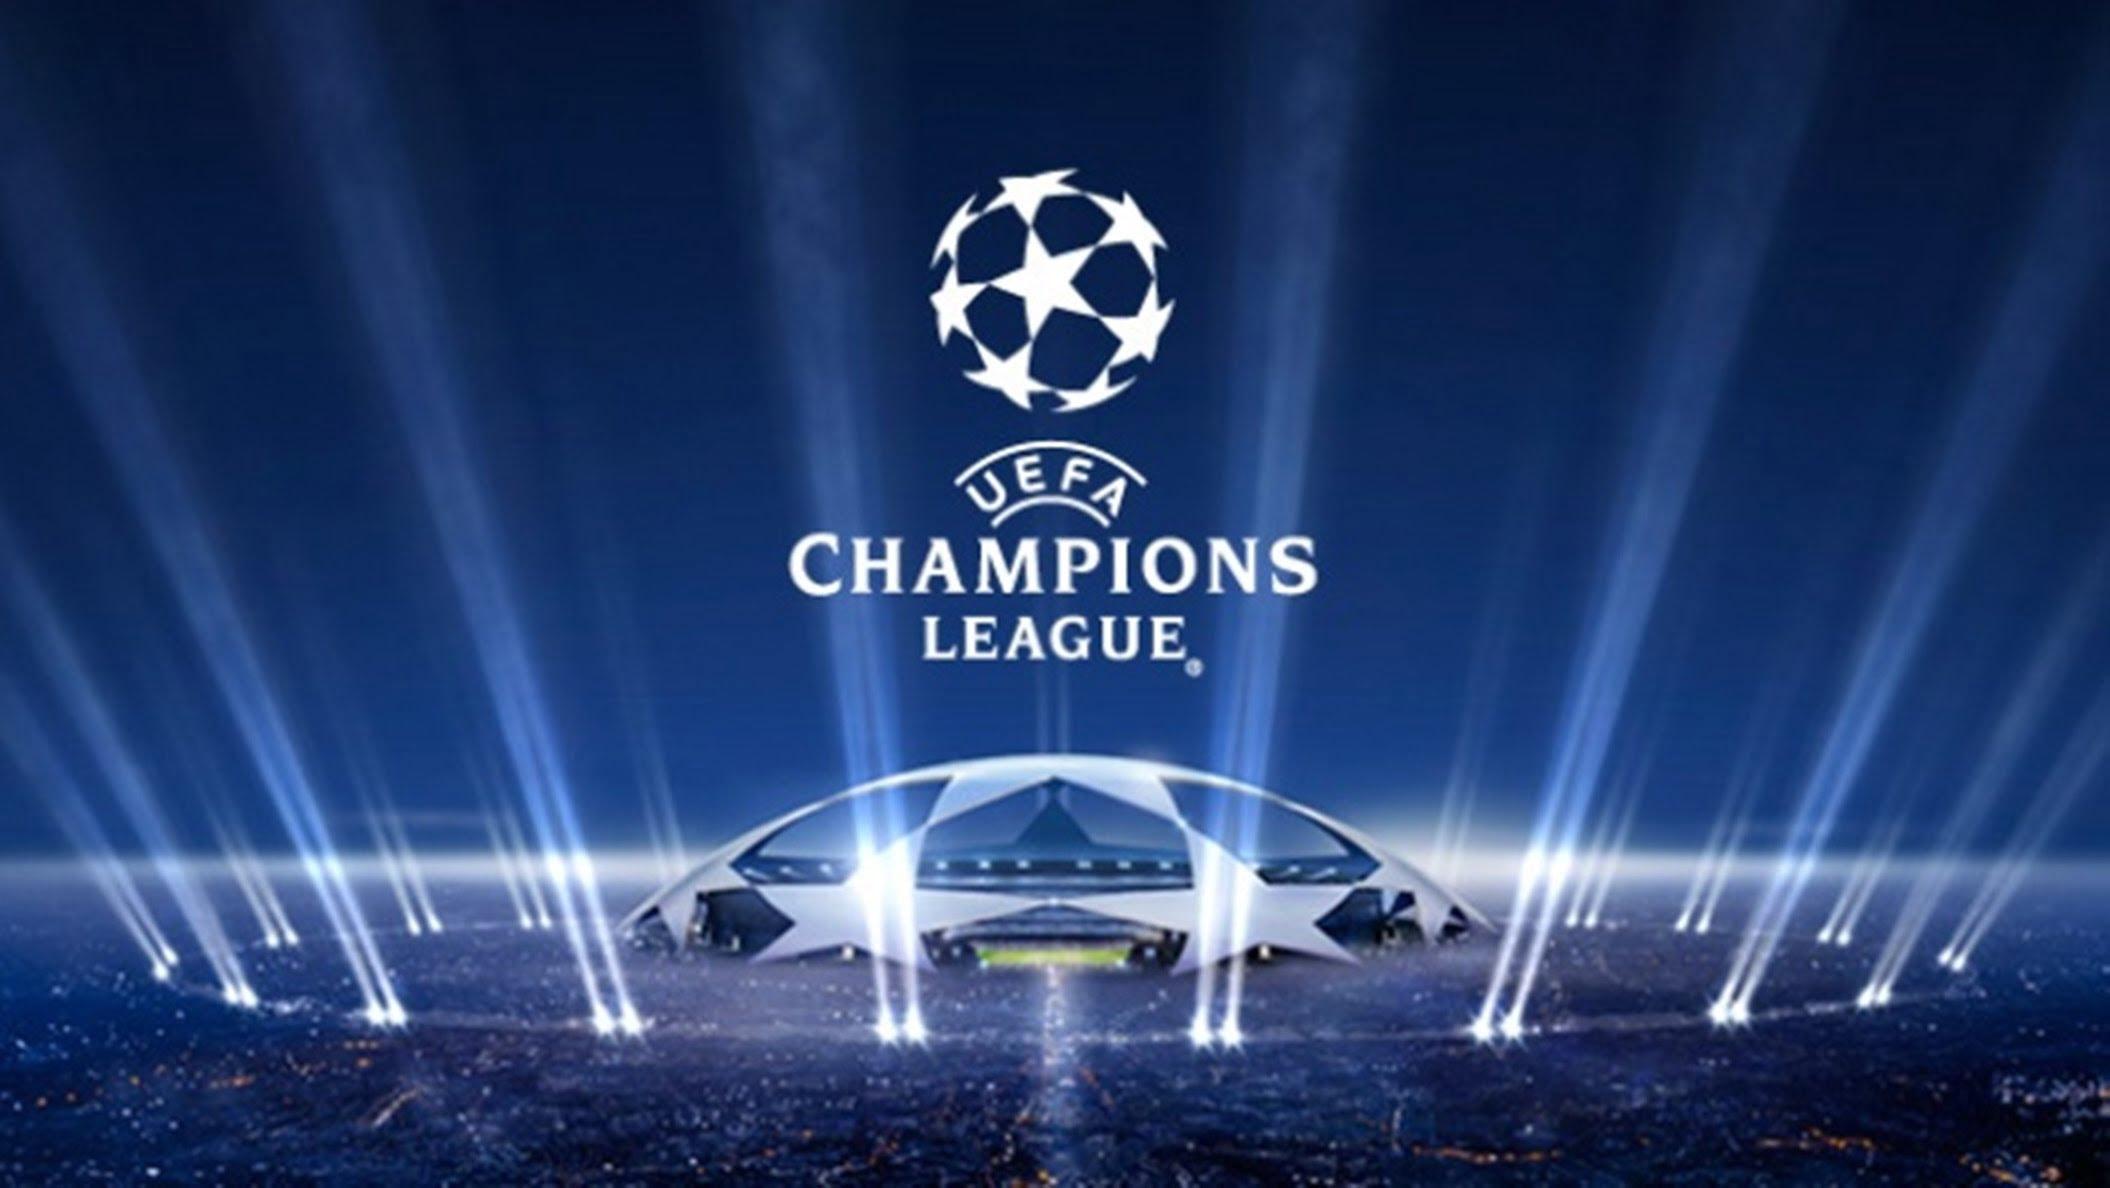 Tokeo la picha la uefa champion league